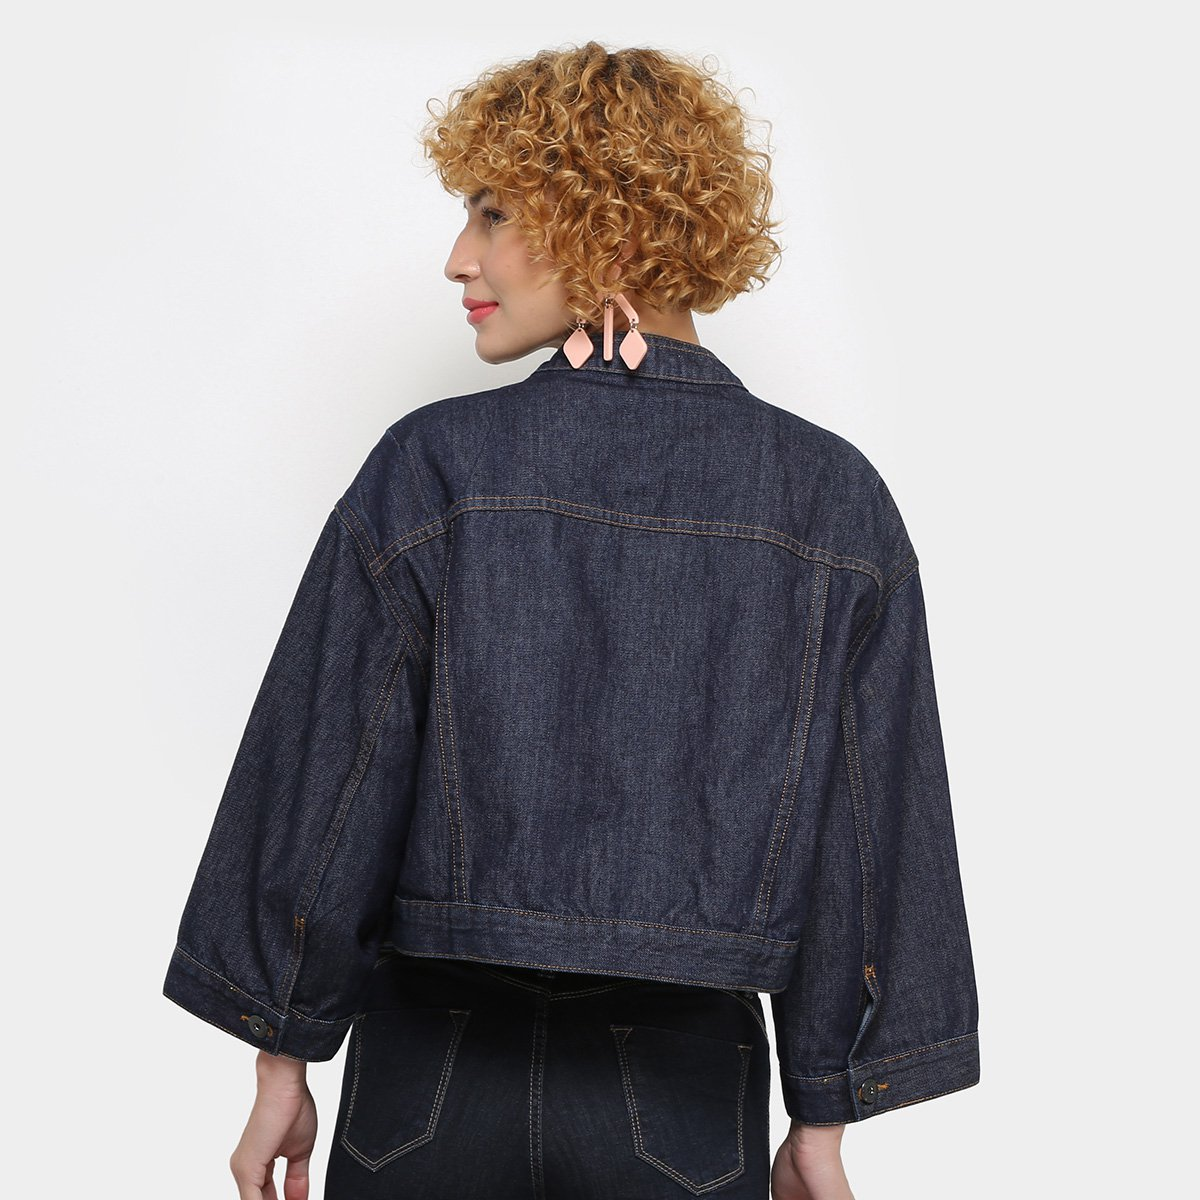 Jaqueta Jeans Colcci Cropped Feminina - Tam: P - 1